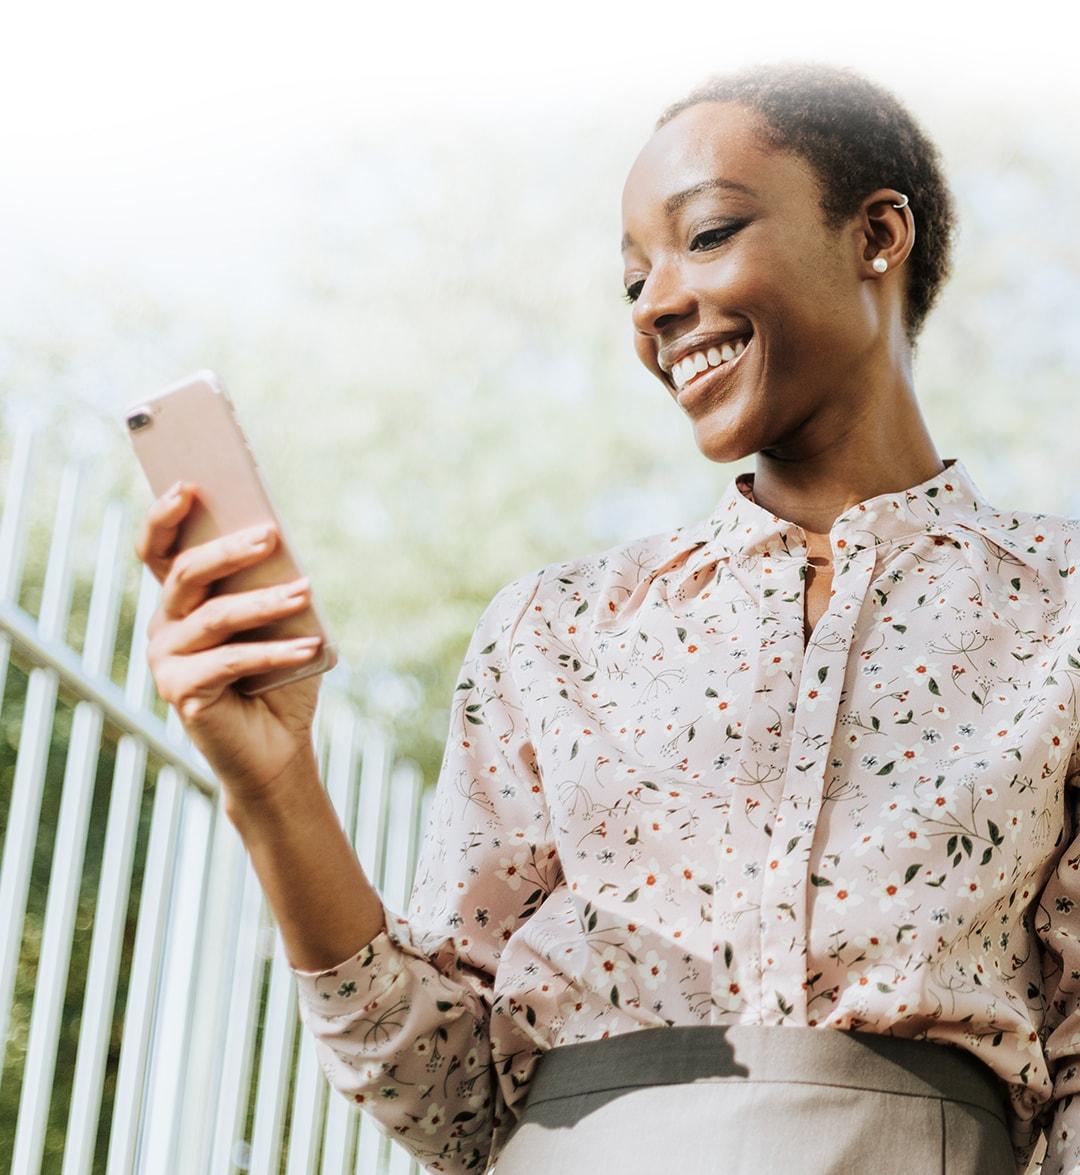 Mujer con un teléfono